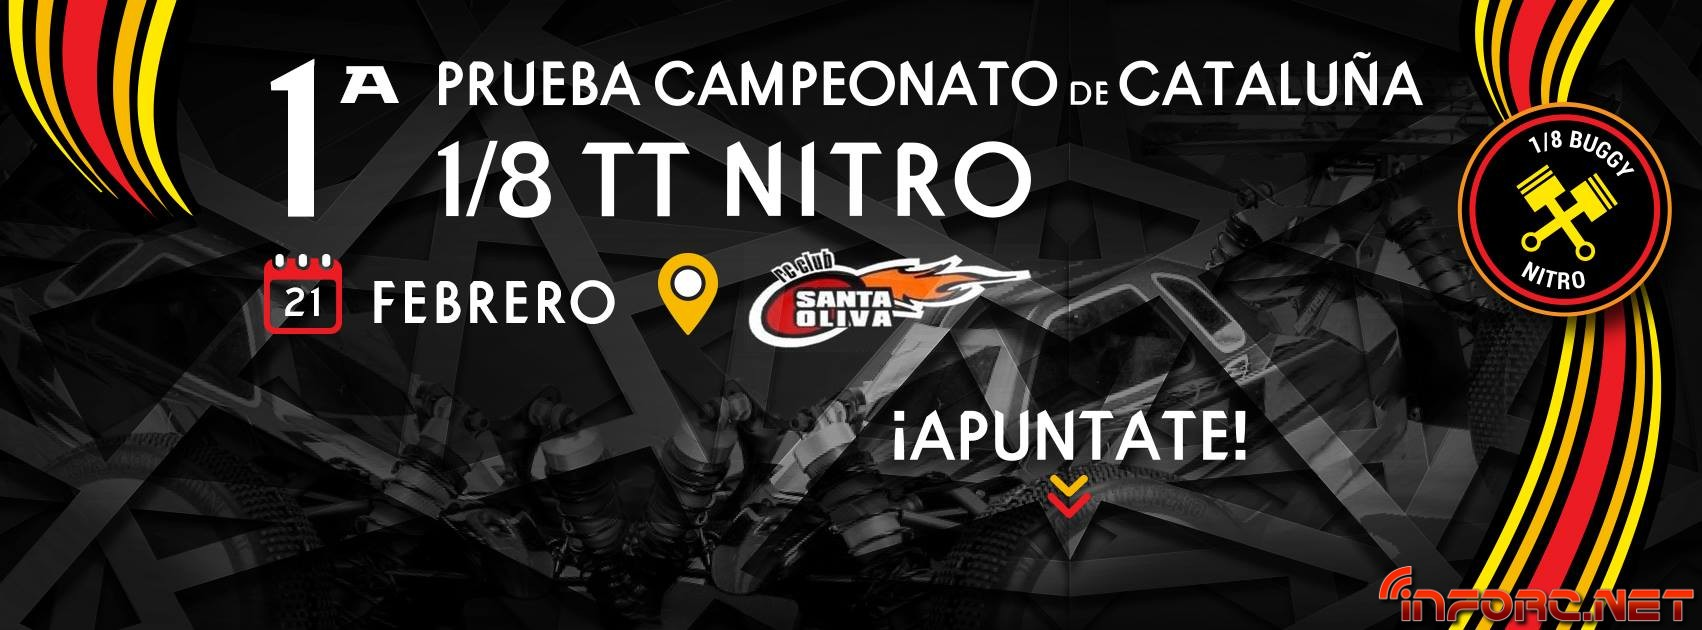 Aecar Nitro